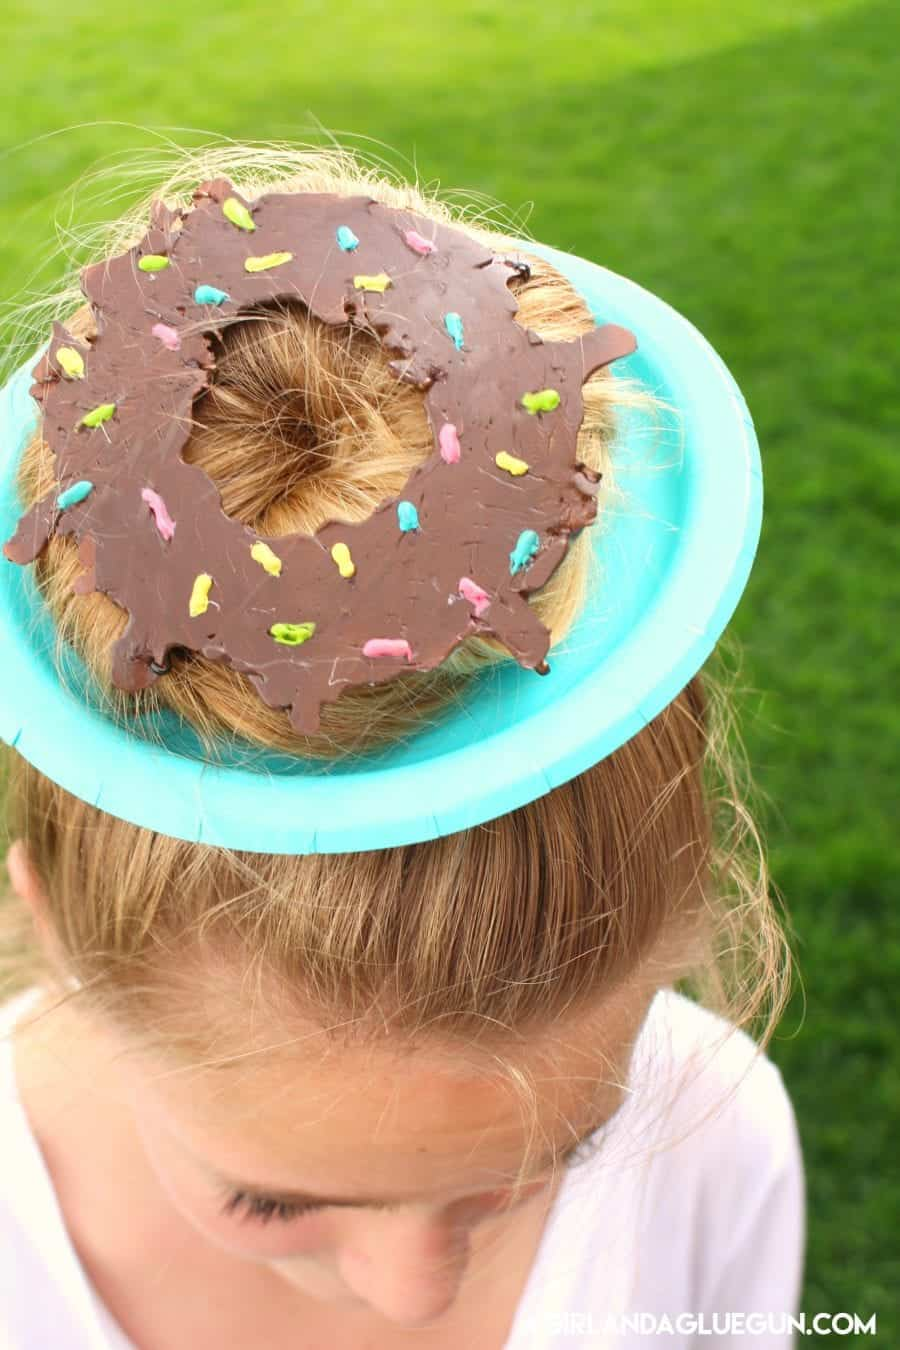 Crazy Crazy Hair Day Donut Newhairstylesformen2014 Com